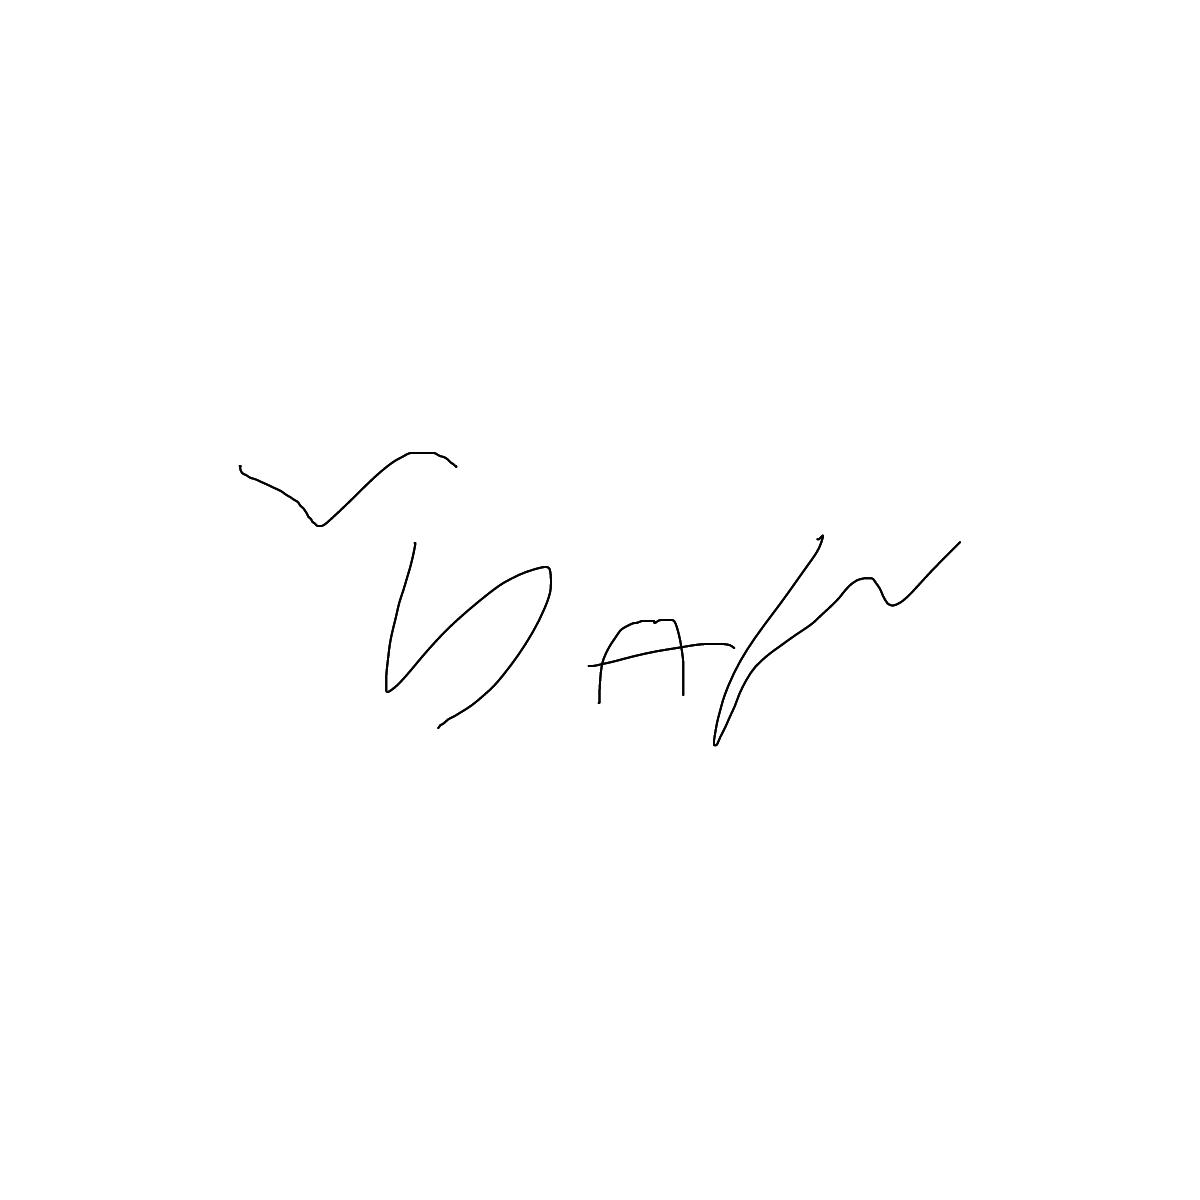 BAAAM drawing#1232 lat:17.1437835693359380lng: 78.4193725585937500